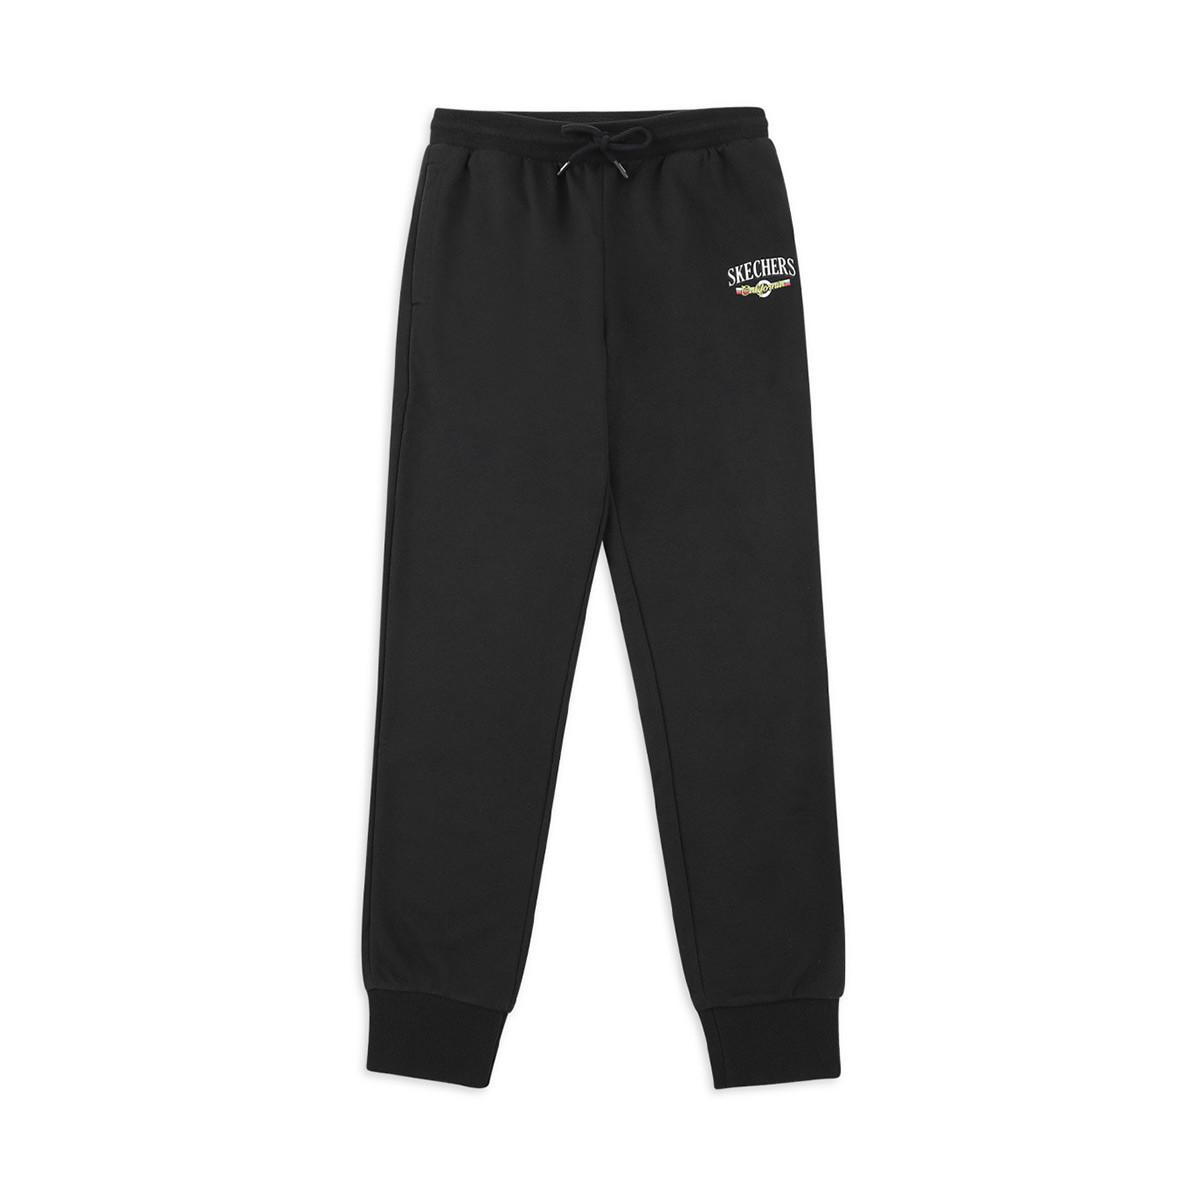 SKECHERS 斯凯奇 男士运动裤 SMAMS19D026-BLAK 黑色 M